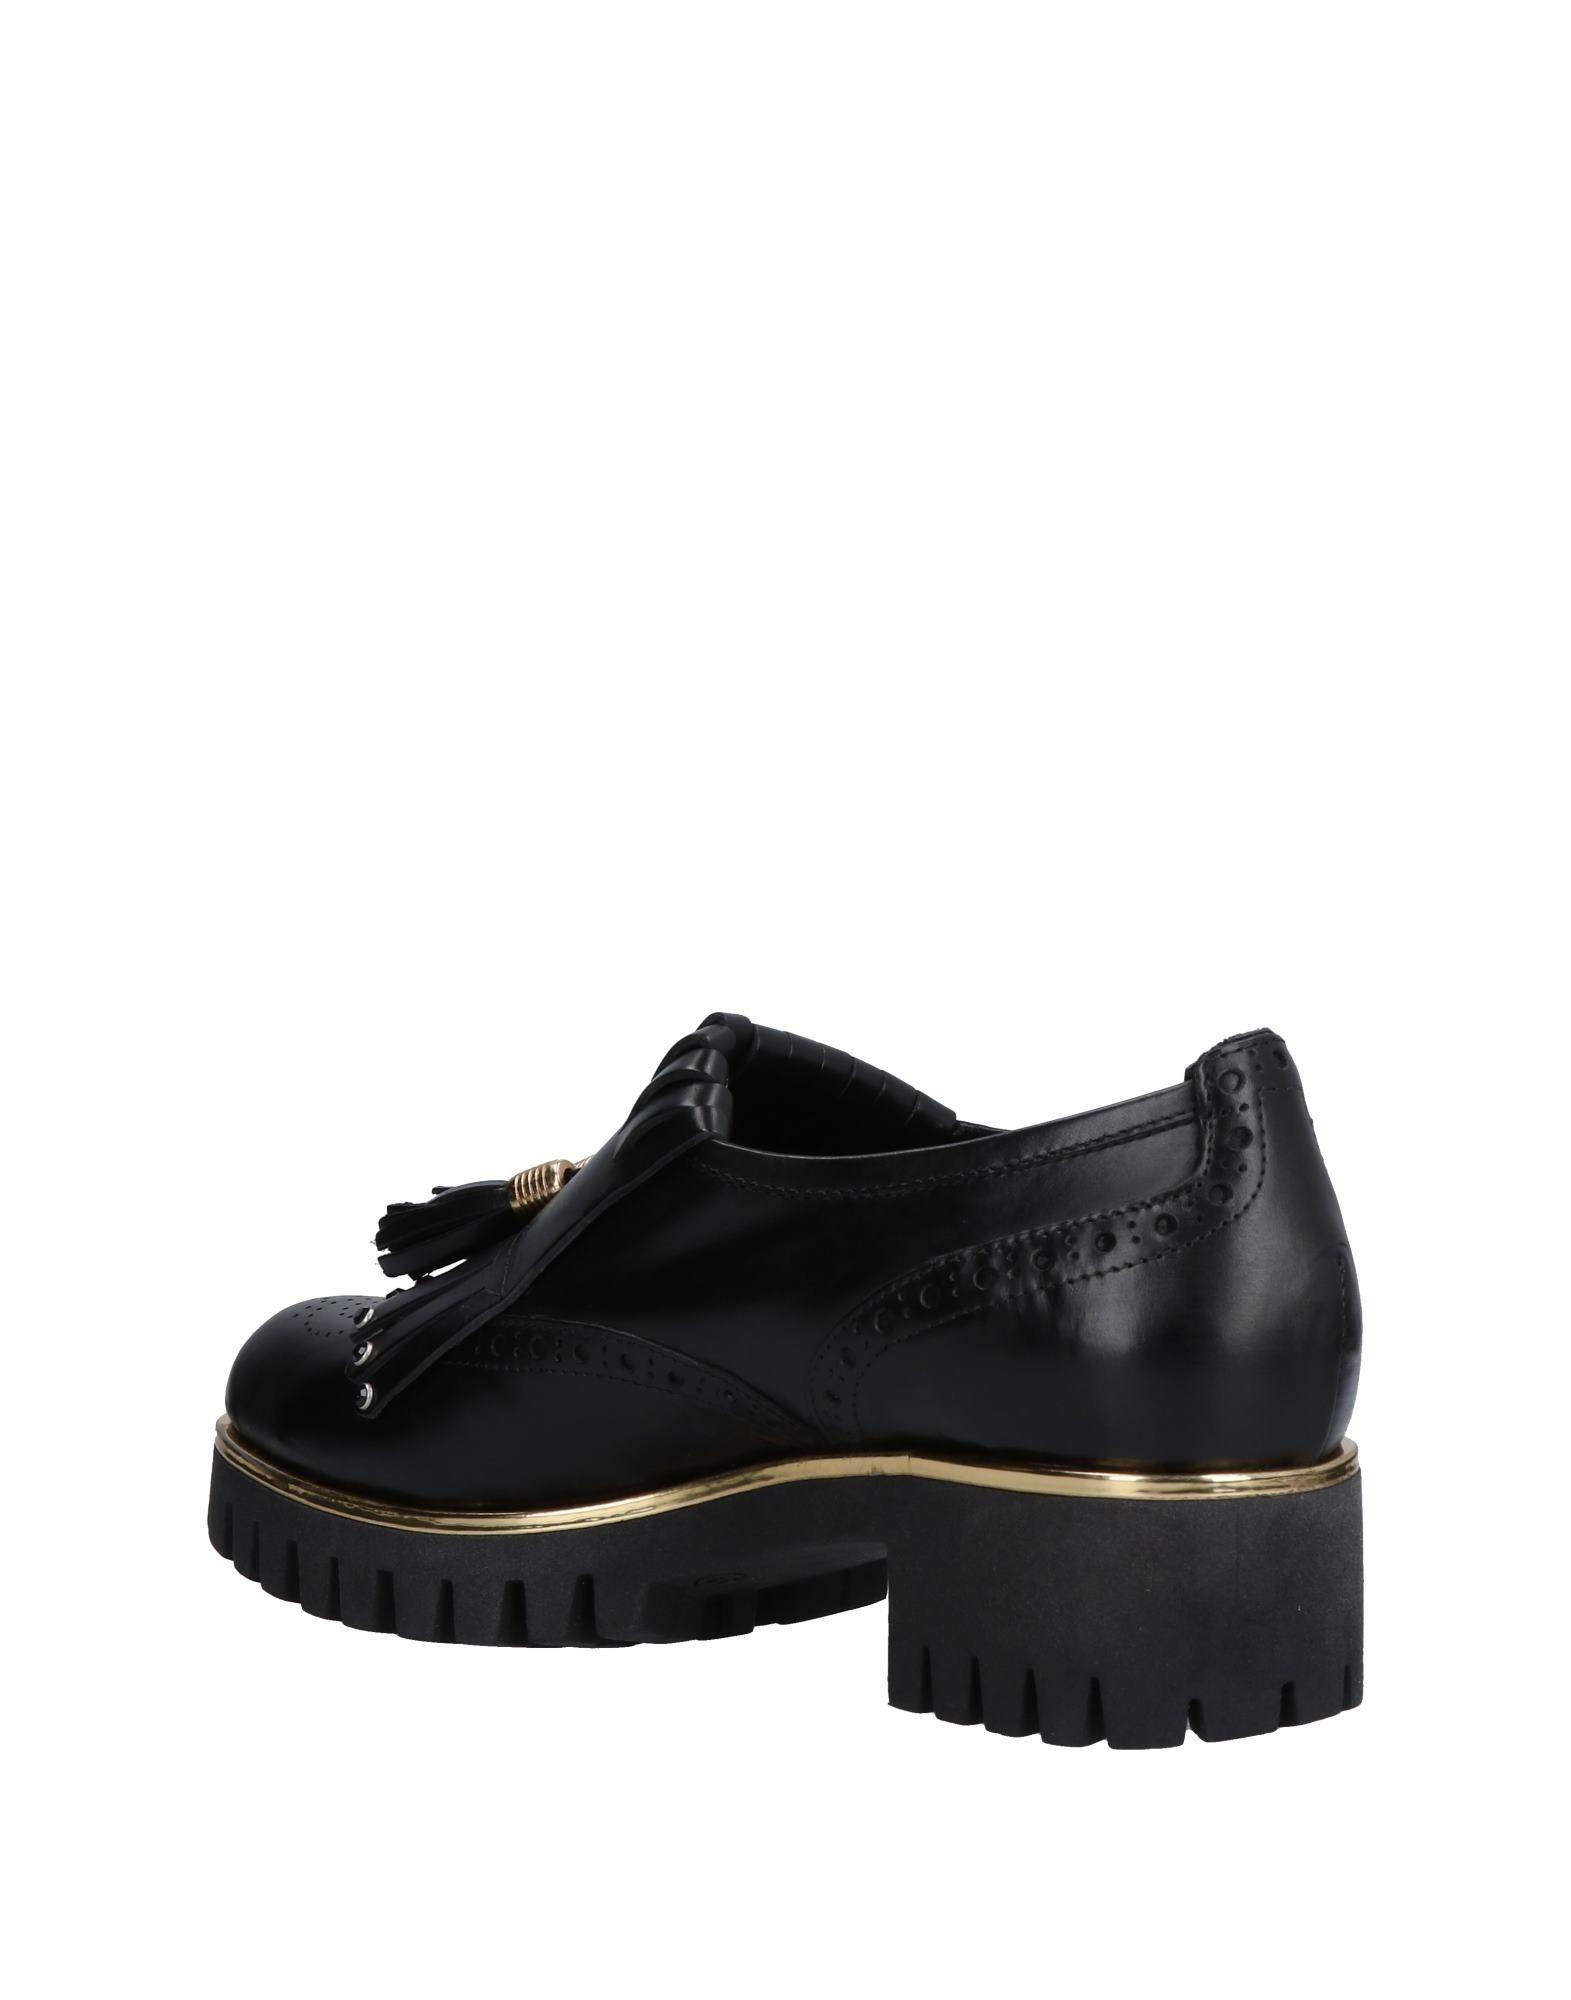 Stilvolle billige Mokassins Schuhe Loretta Pettinari Mokassins billige Damen  11496210RJ 745ea7